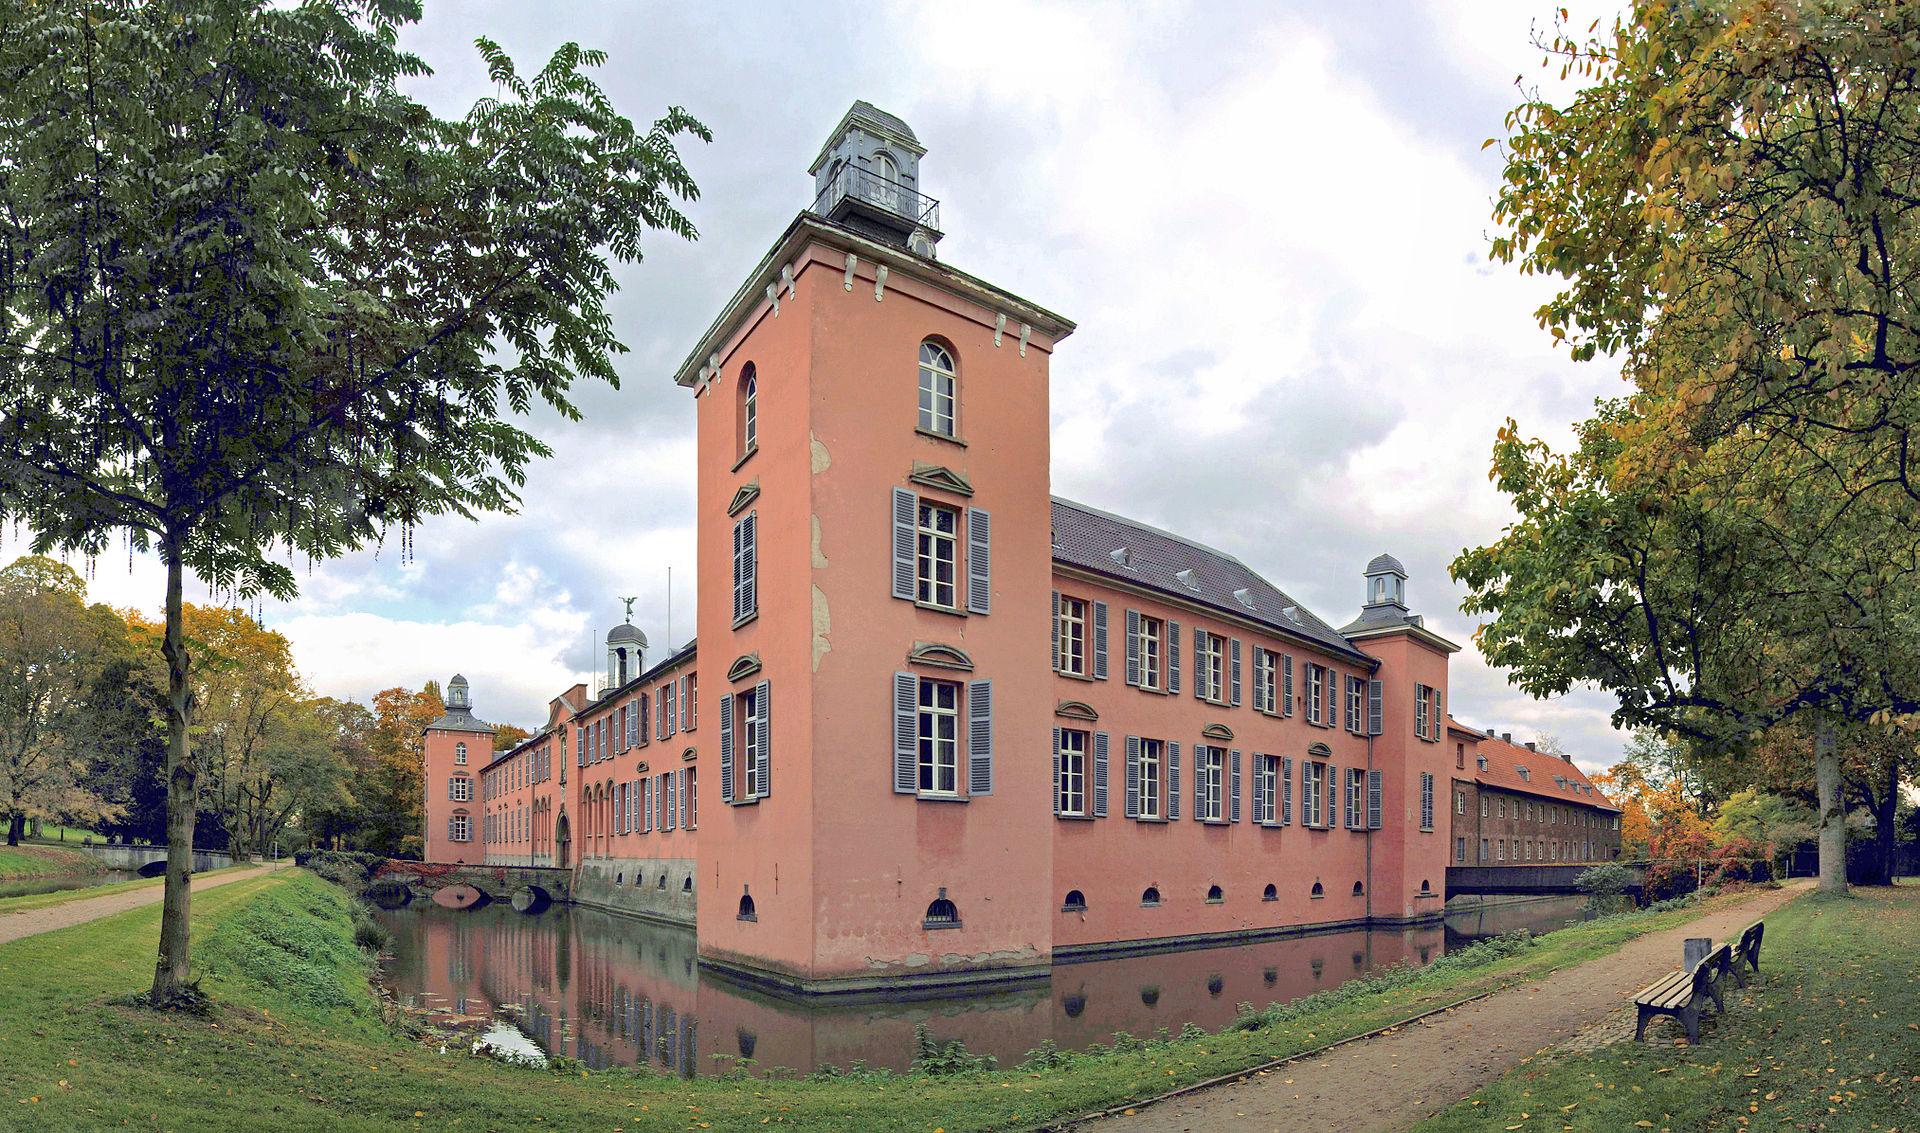 Bild Schloss Kalkum Düsseldorf